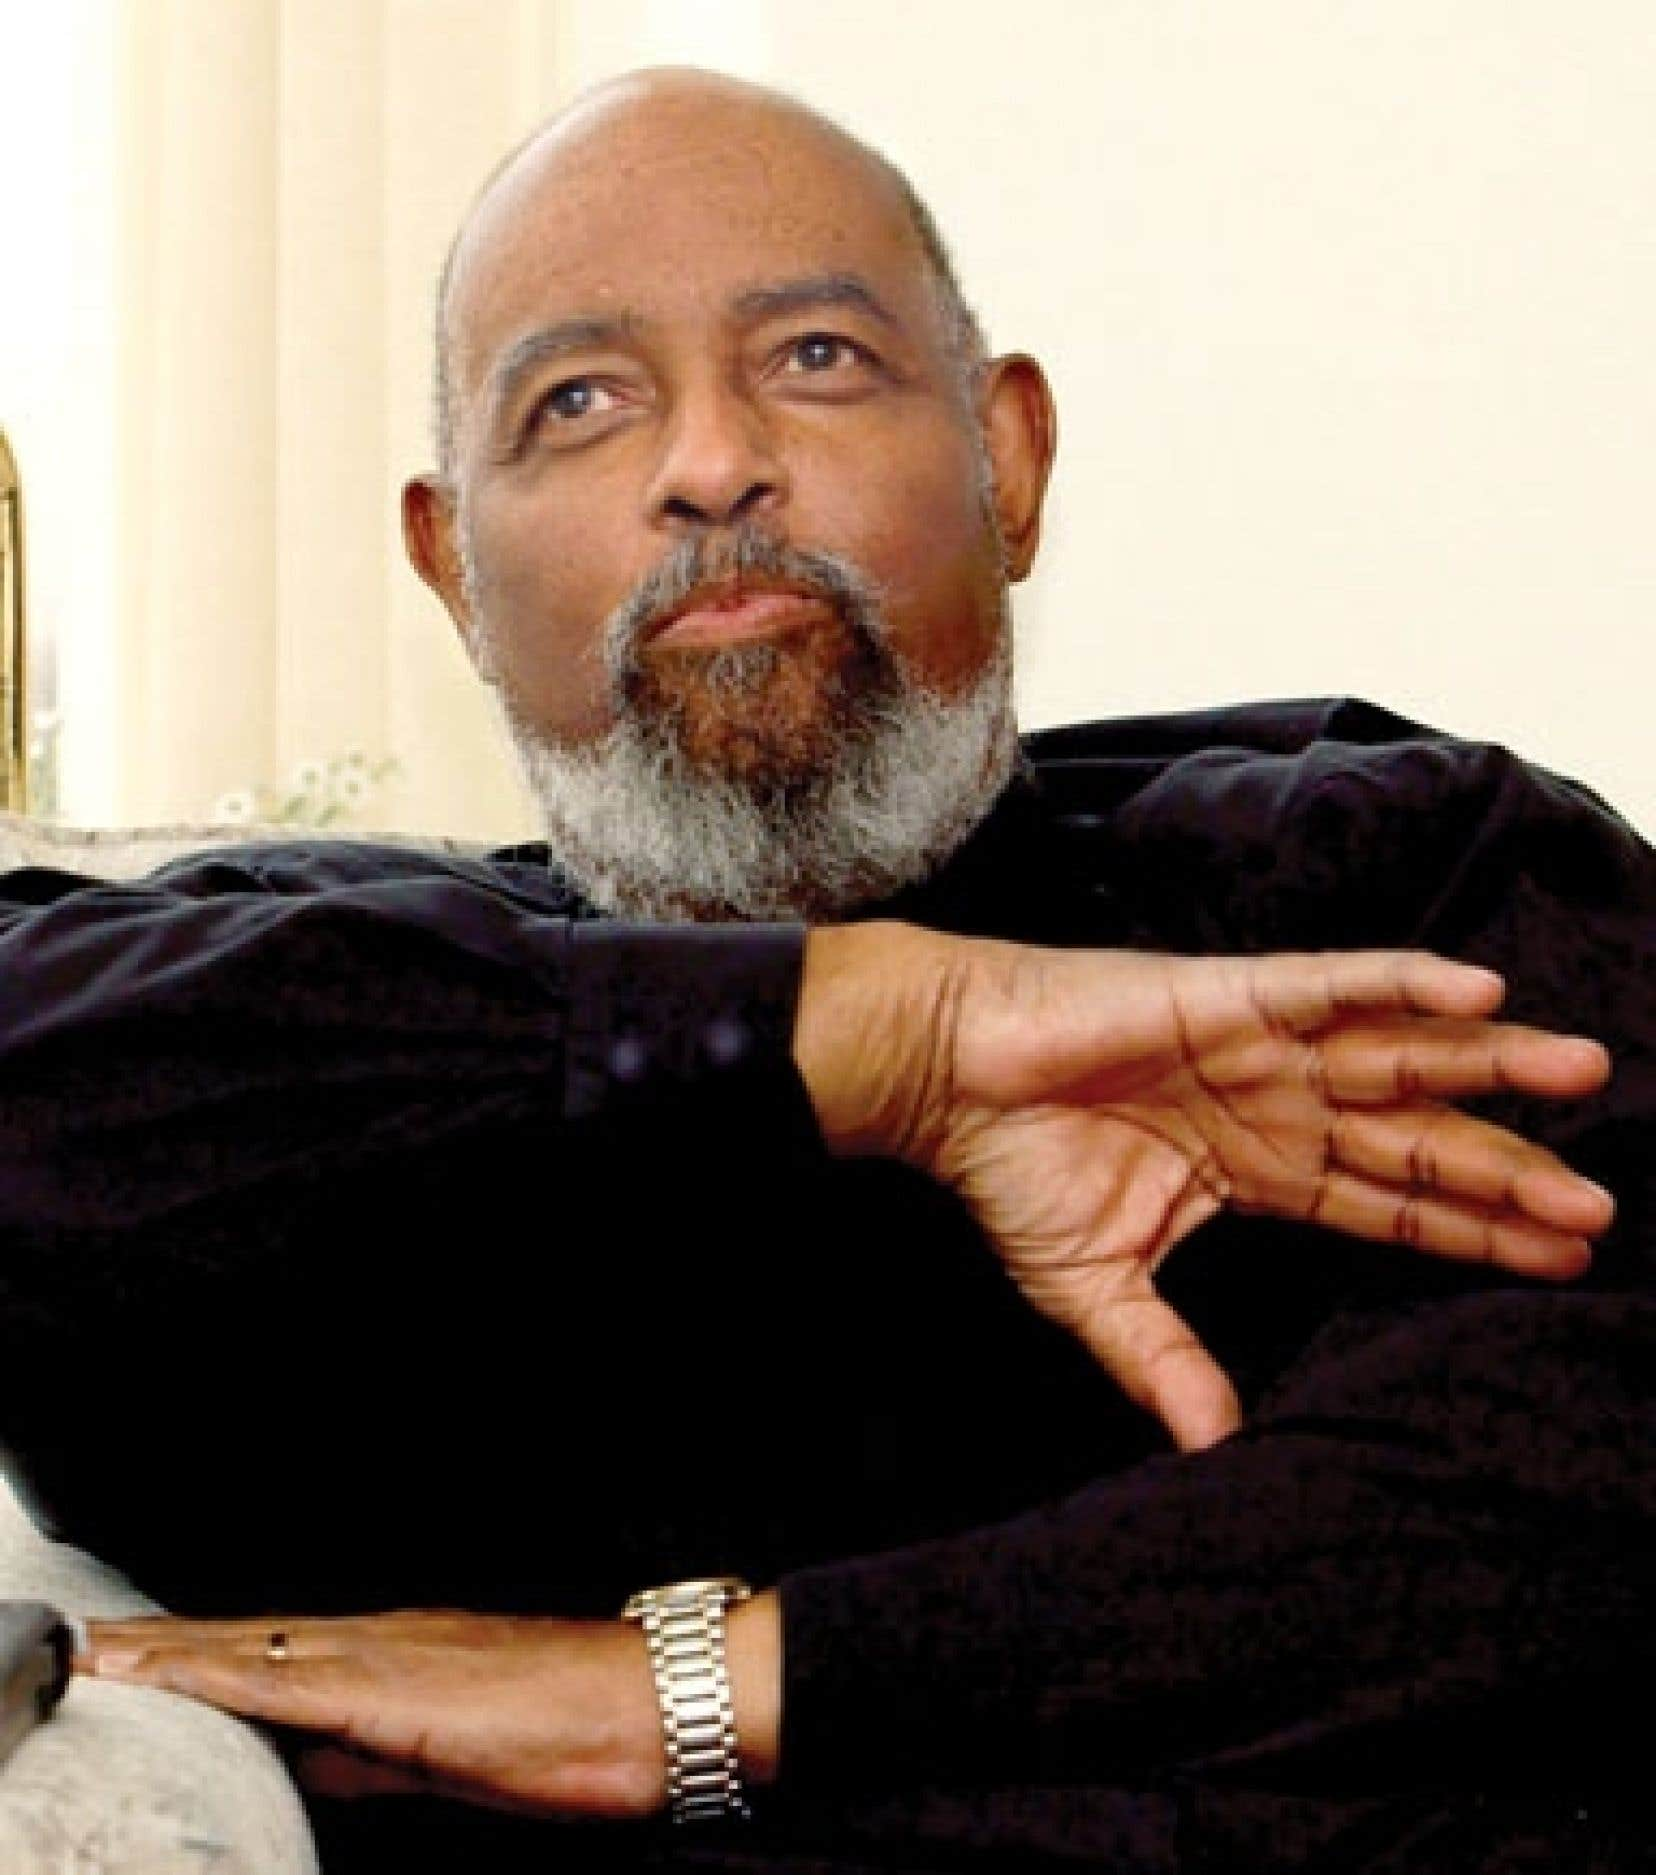 James DePreist en 2002